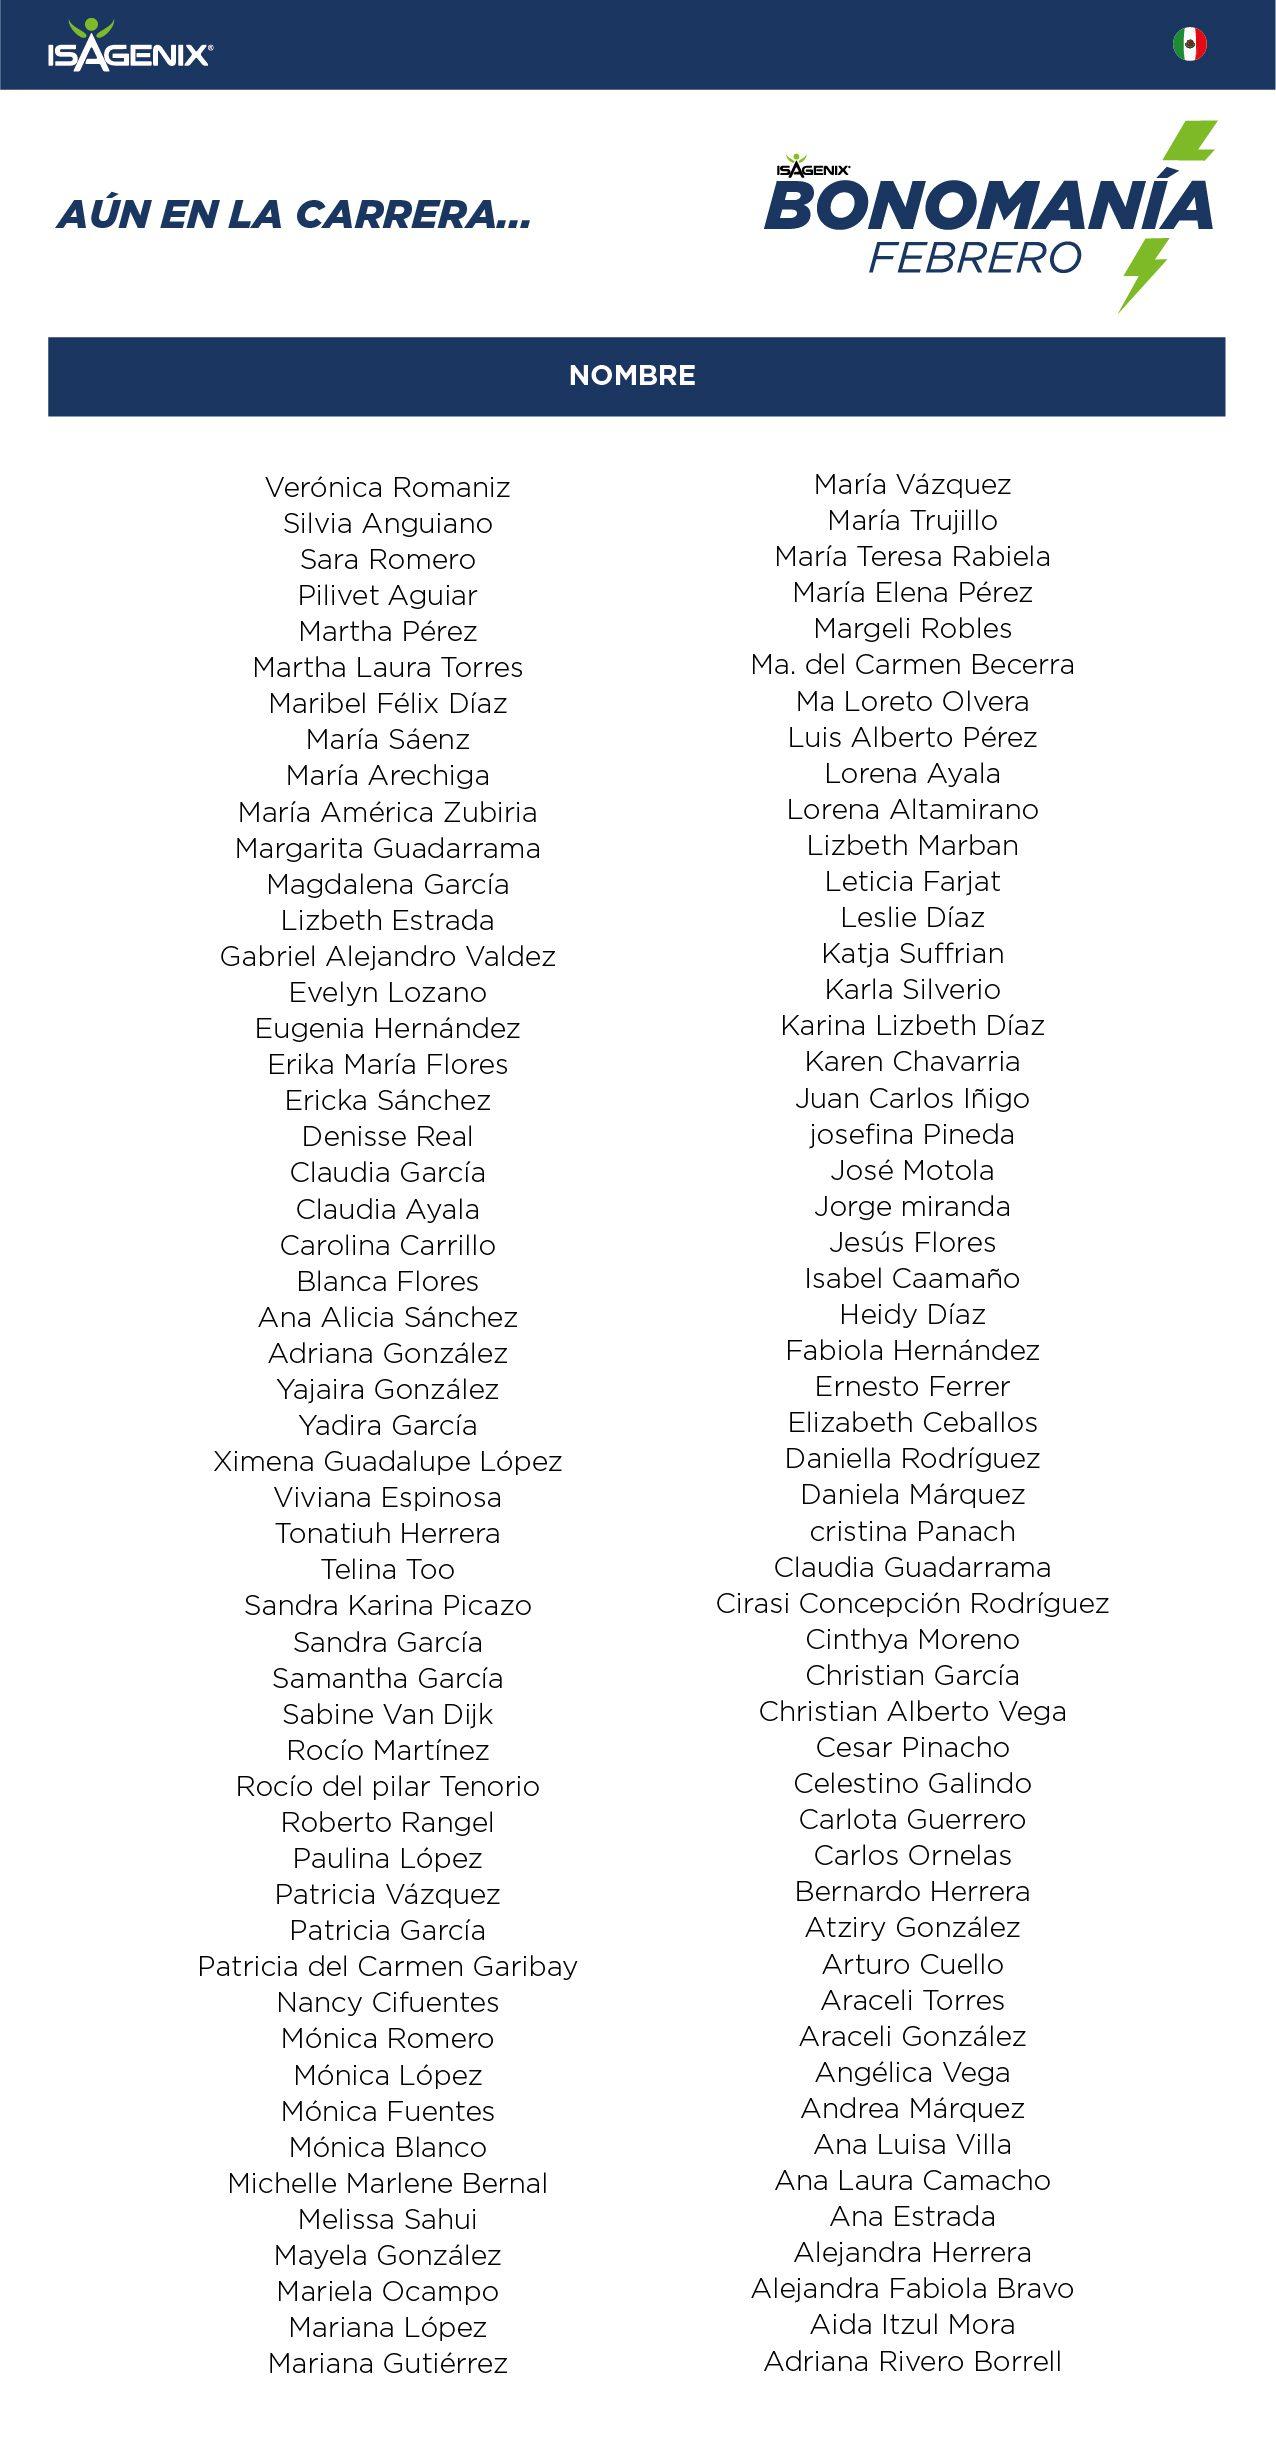 lista-ganadores_bonomania_febrero_3-02